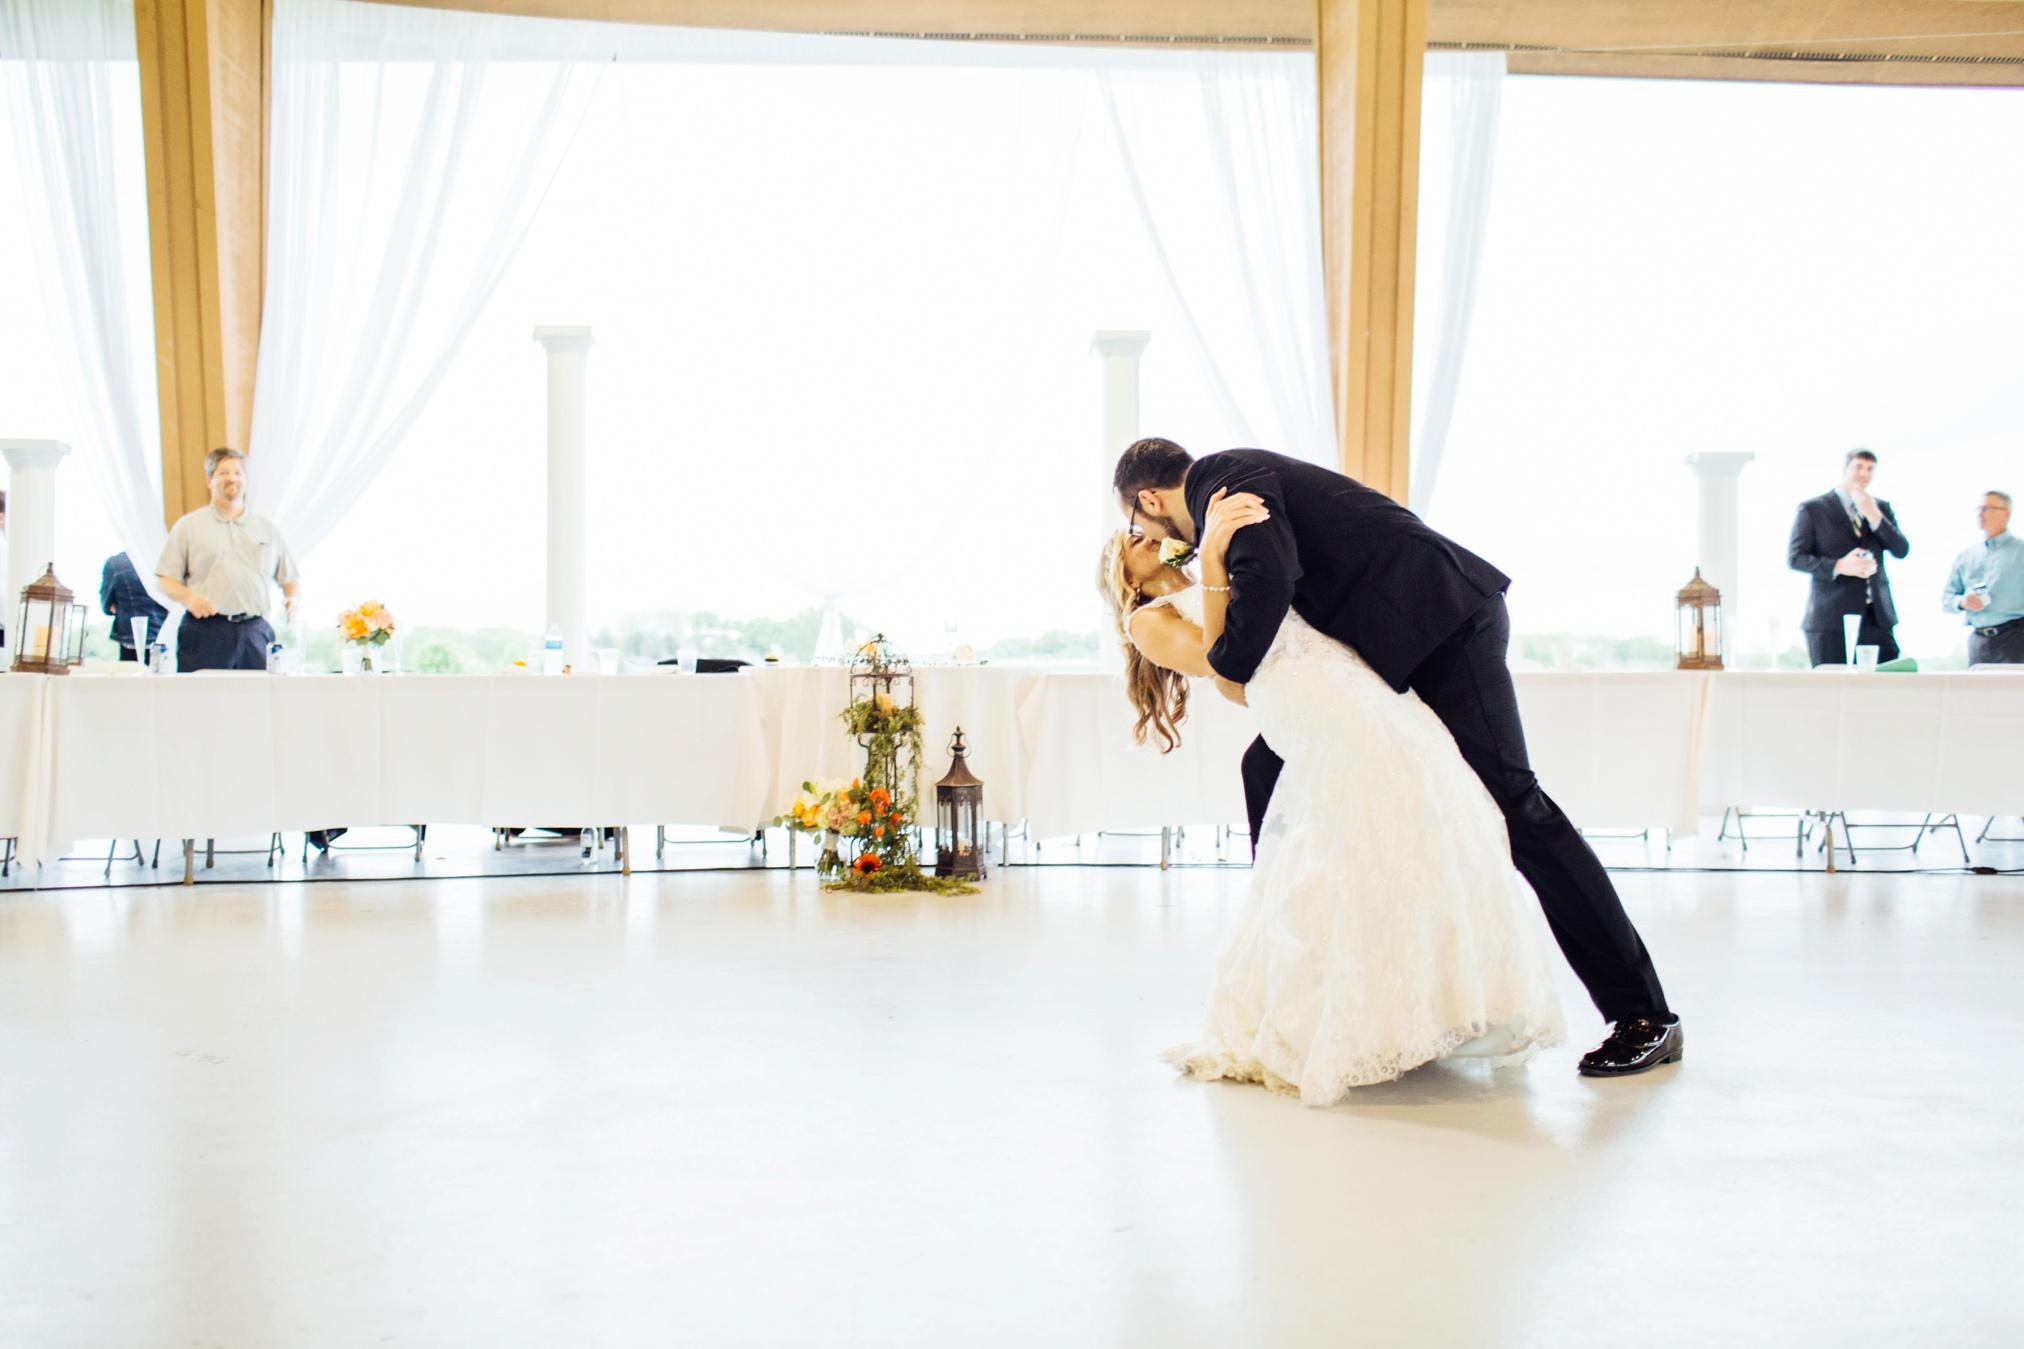 schmid_wedding-776.jpg